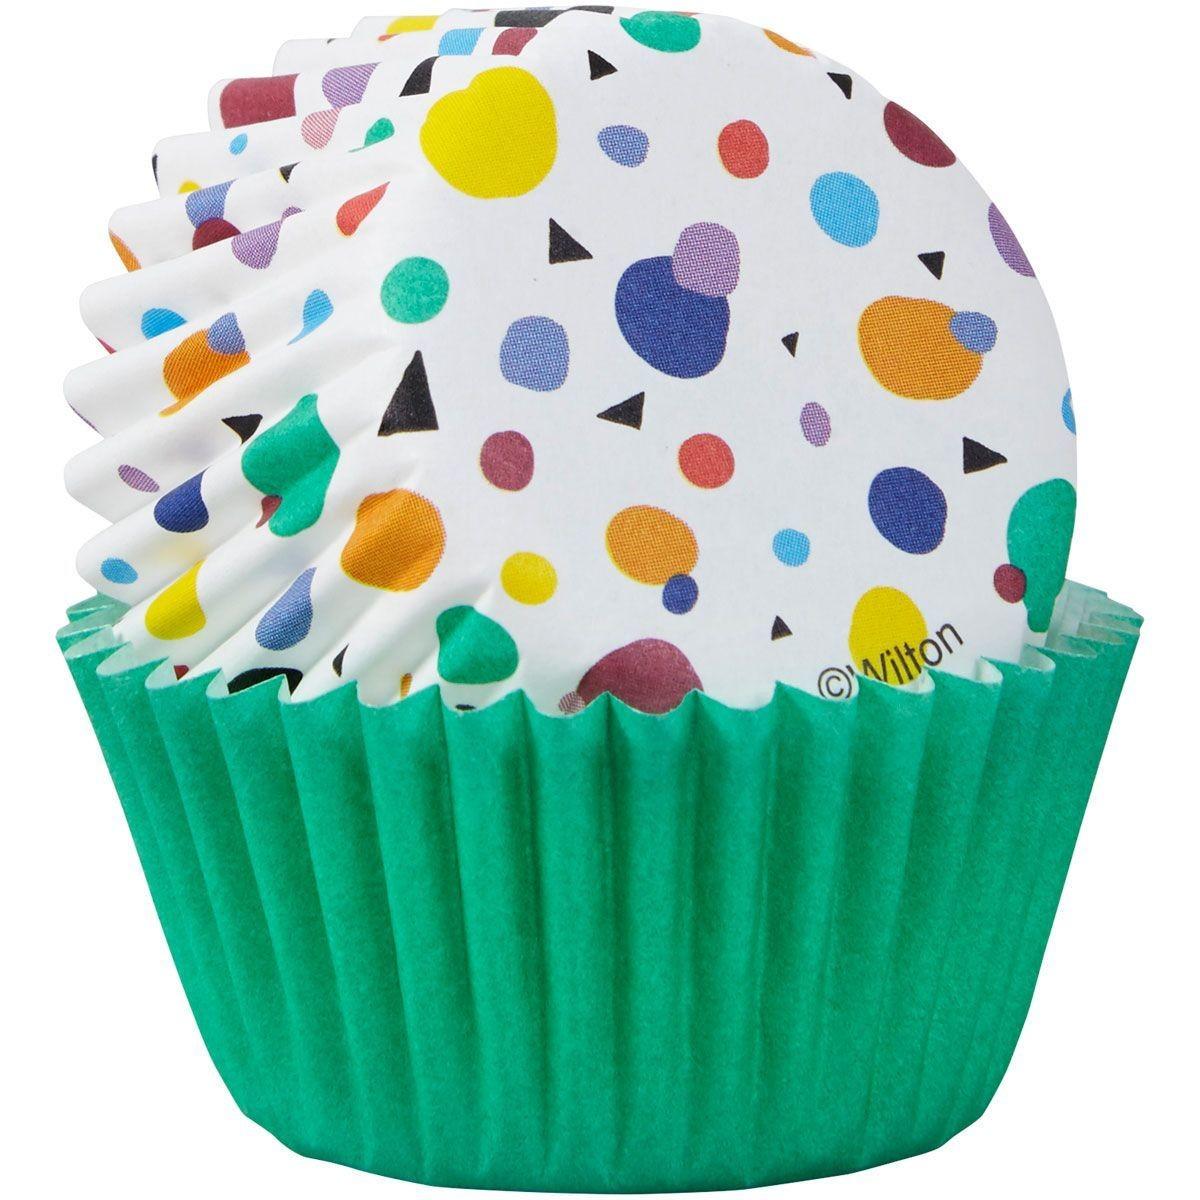 Wilton Cupcake Cases -MINI -MAX DOTS TRIANGLES - Μίνι Θήκες ψησίματος 100τμχ